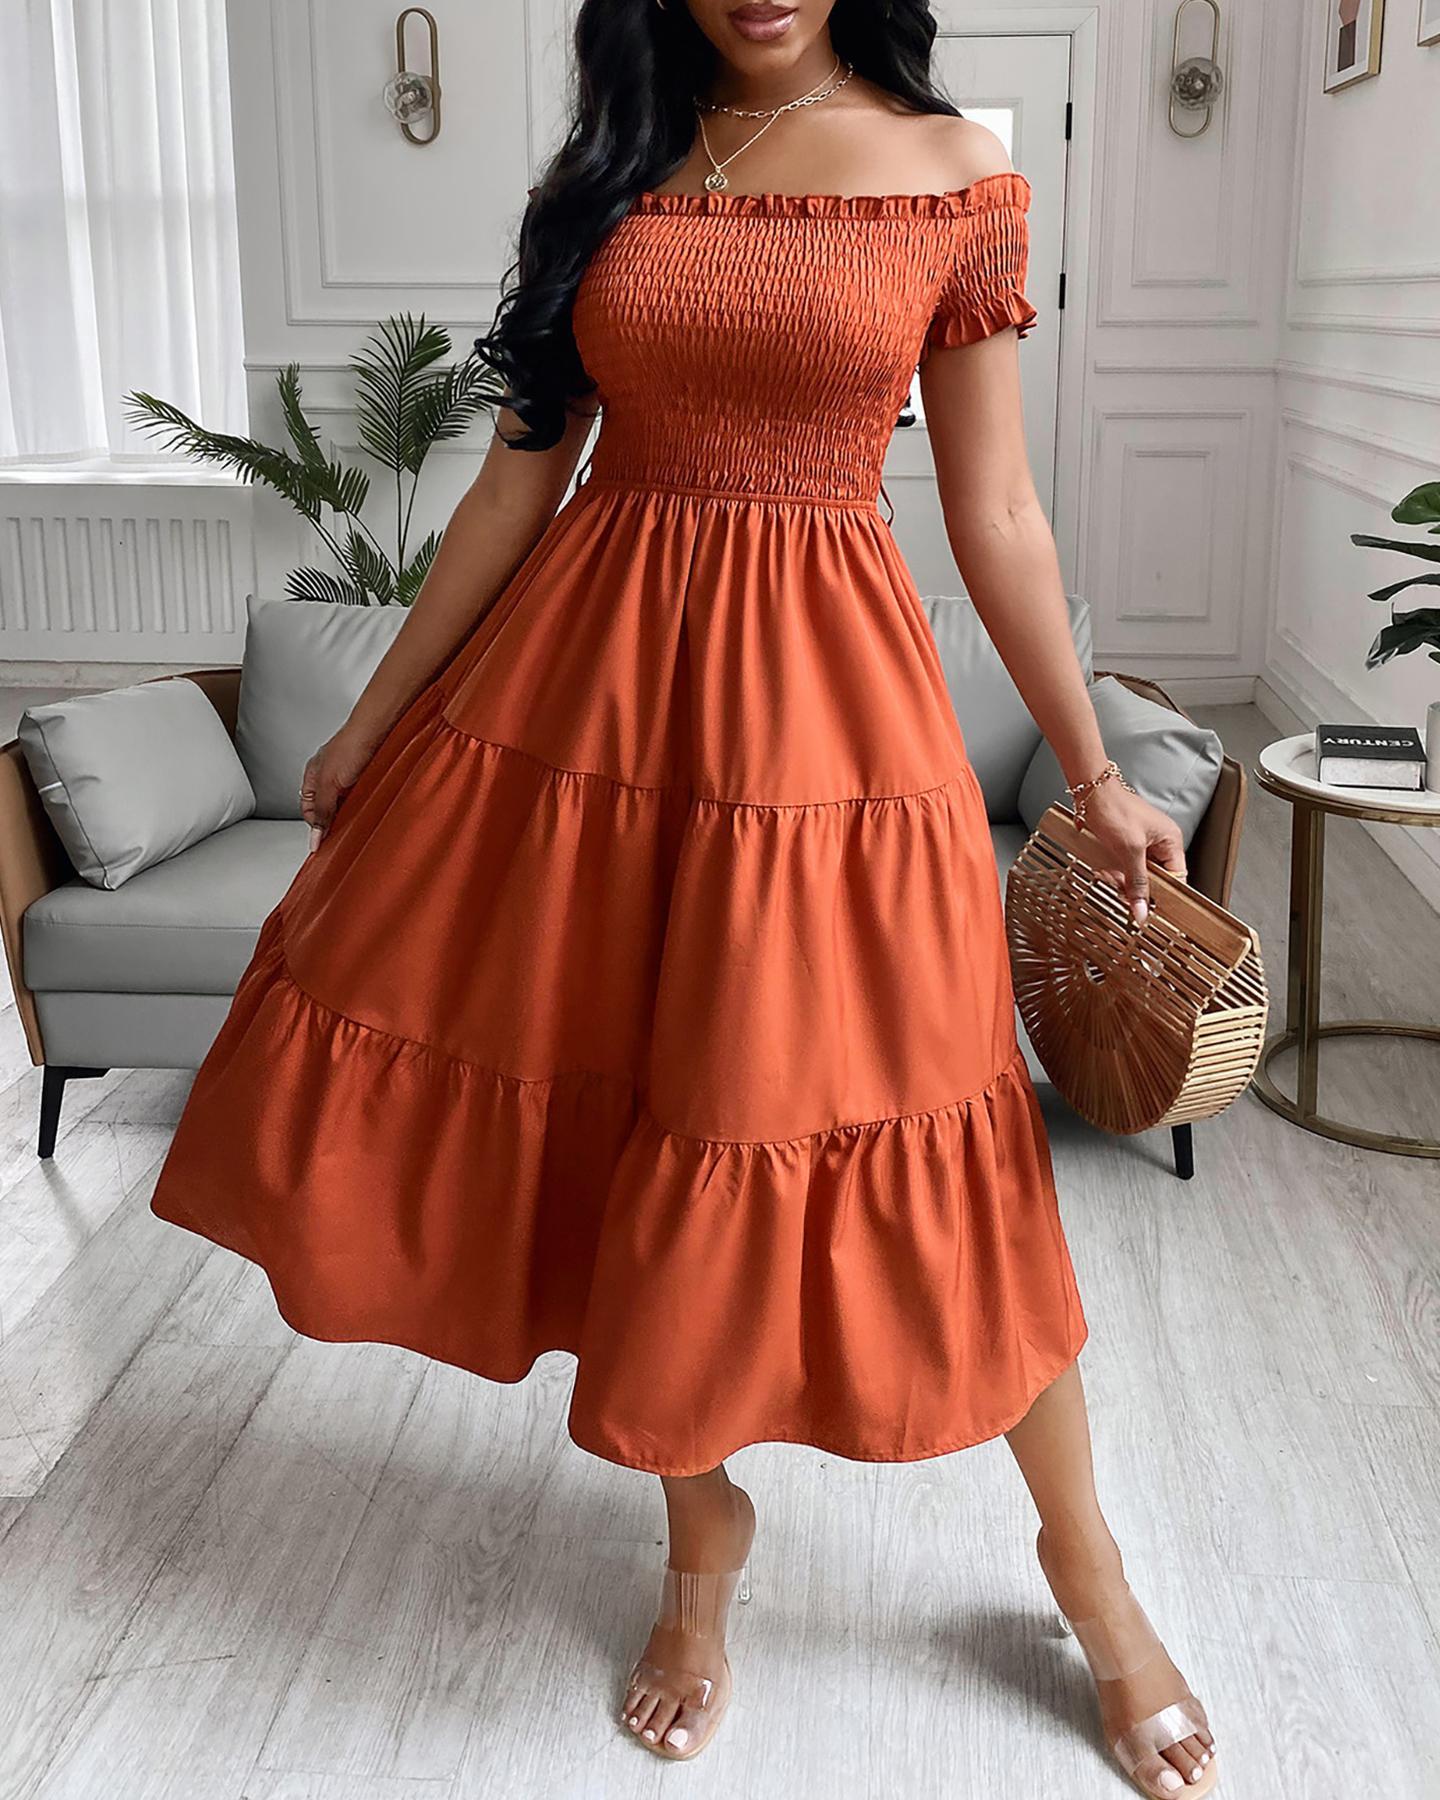 Solid Off Shoulder Frill Trim Shirred Bodice Layered Dress